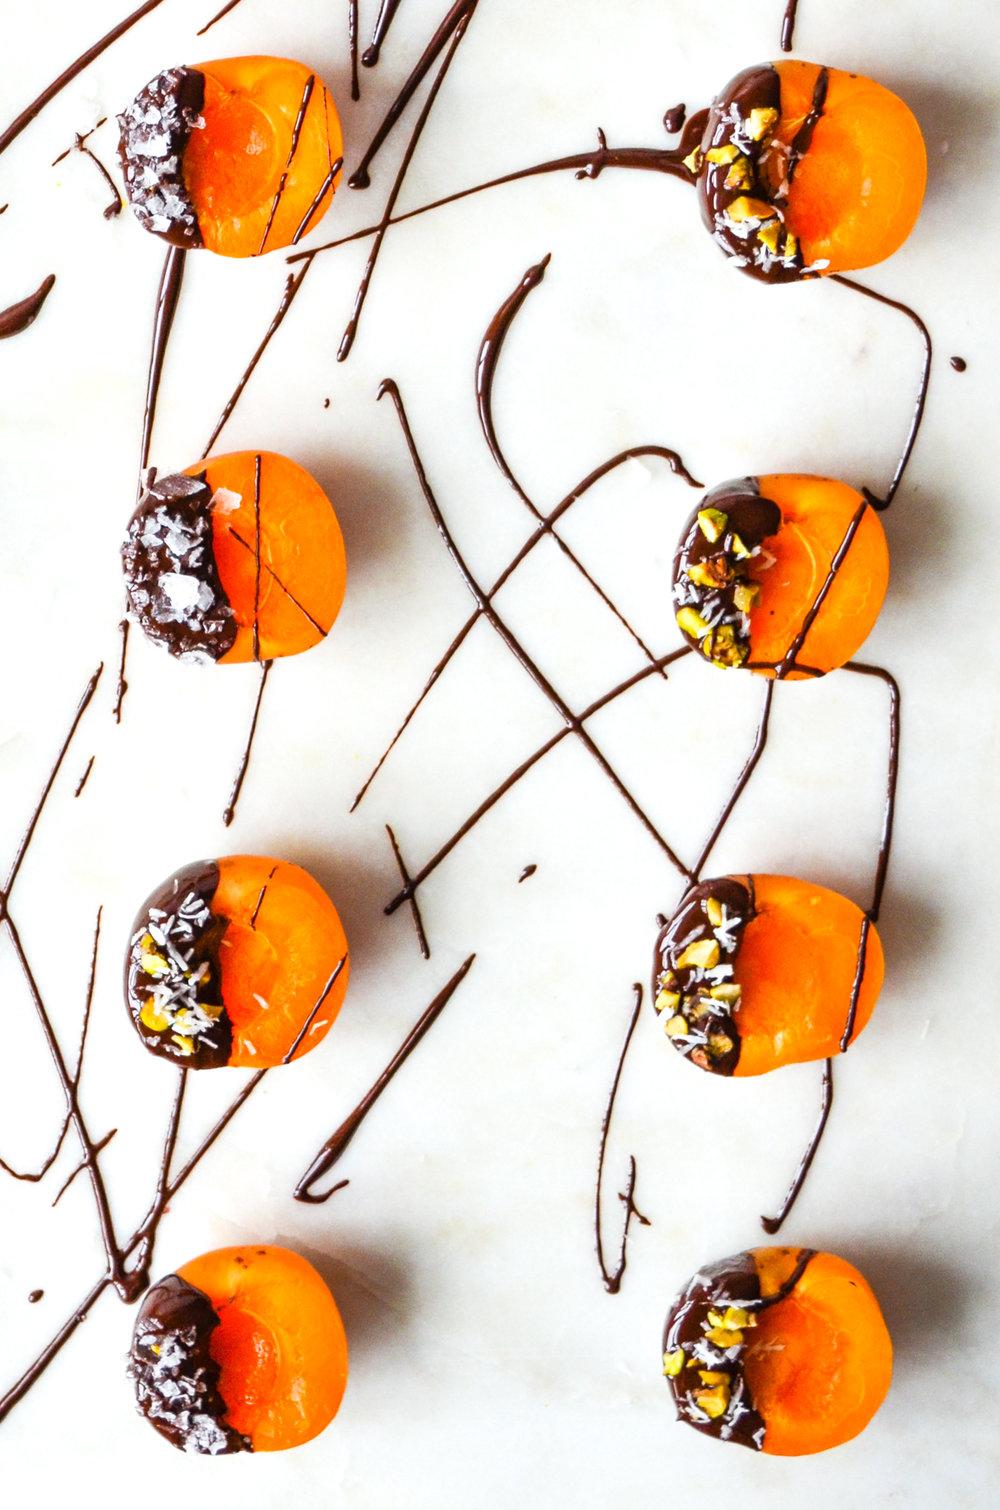 paleo chocolate covered apricots :: #OITNB ShiraRD #paleo #refinedsugarfree #SnacksbyShira #orangeisthenewblack